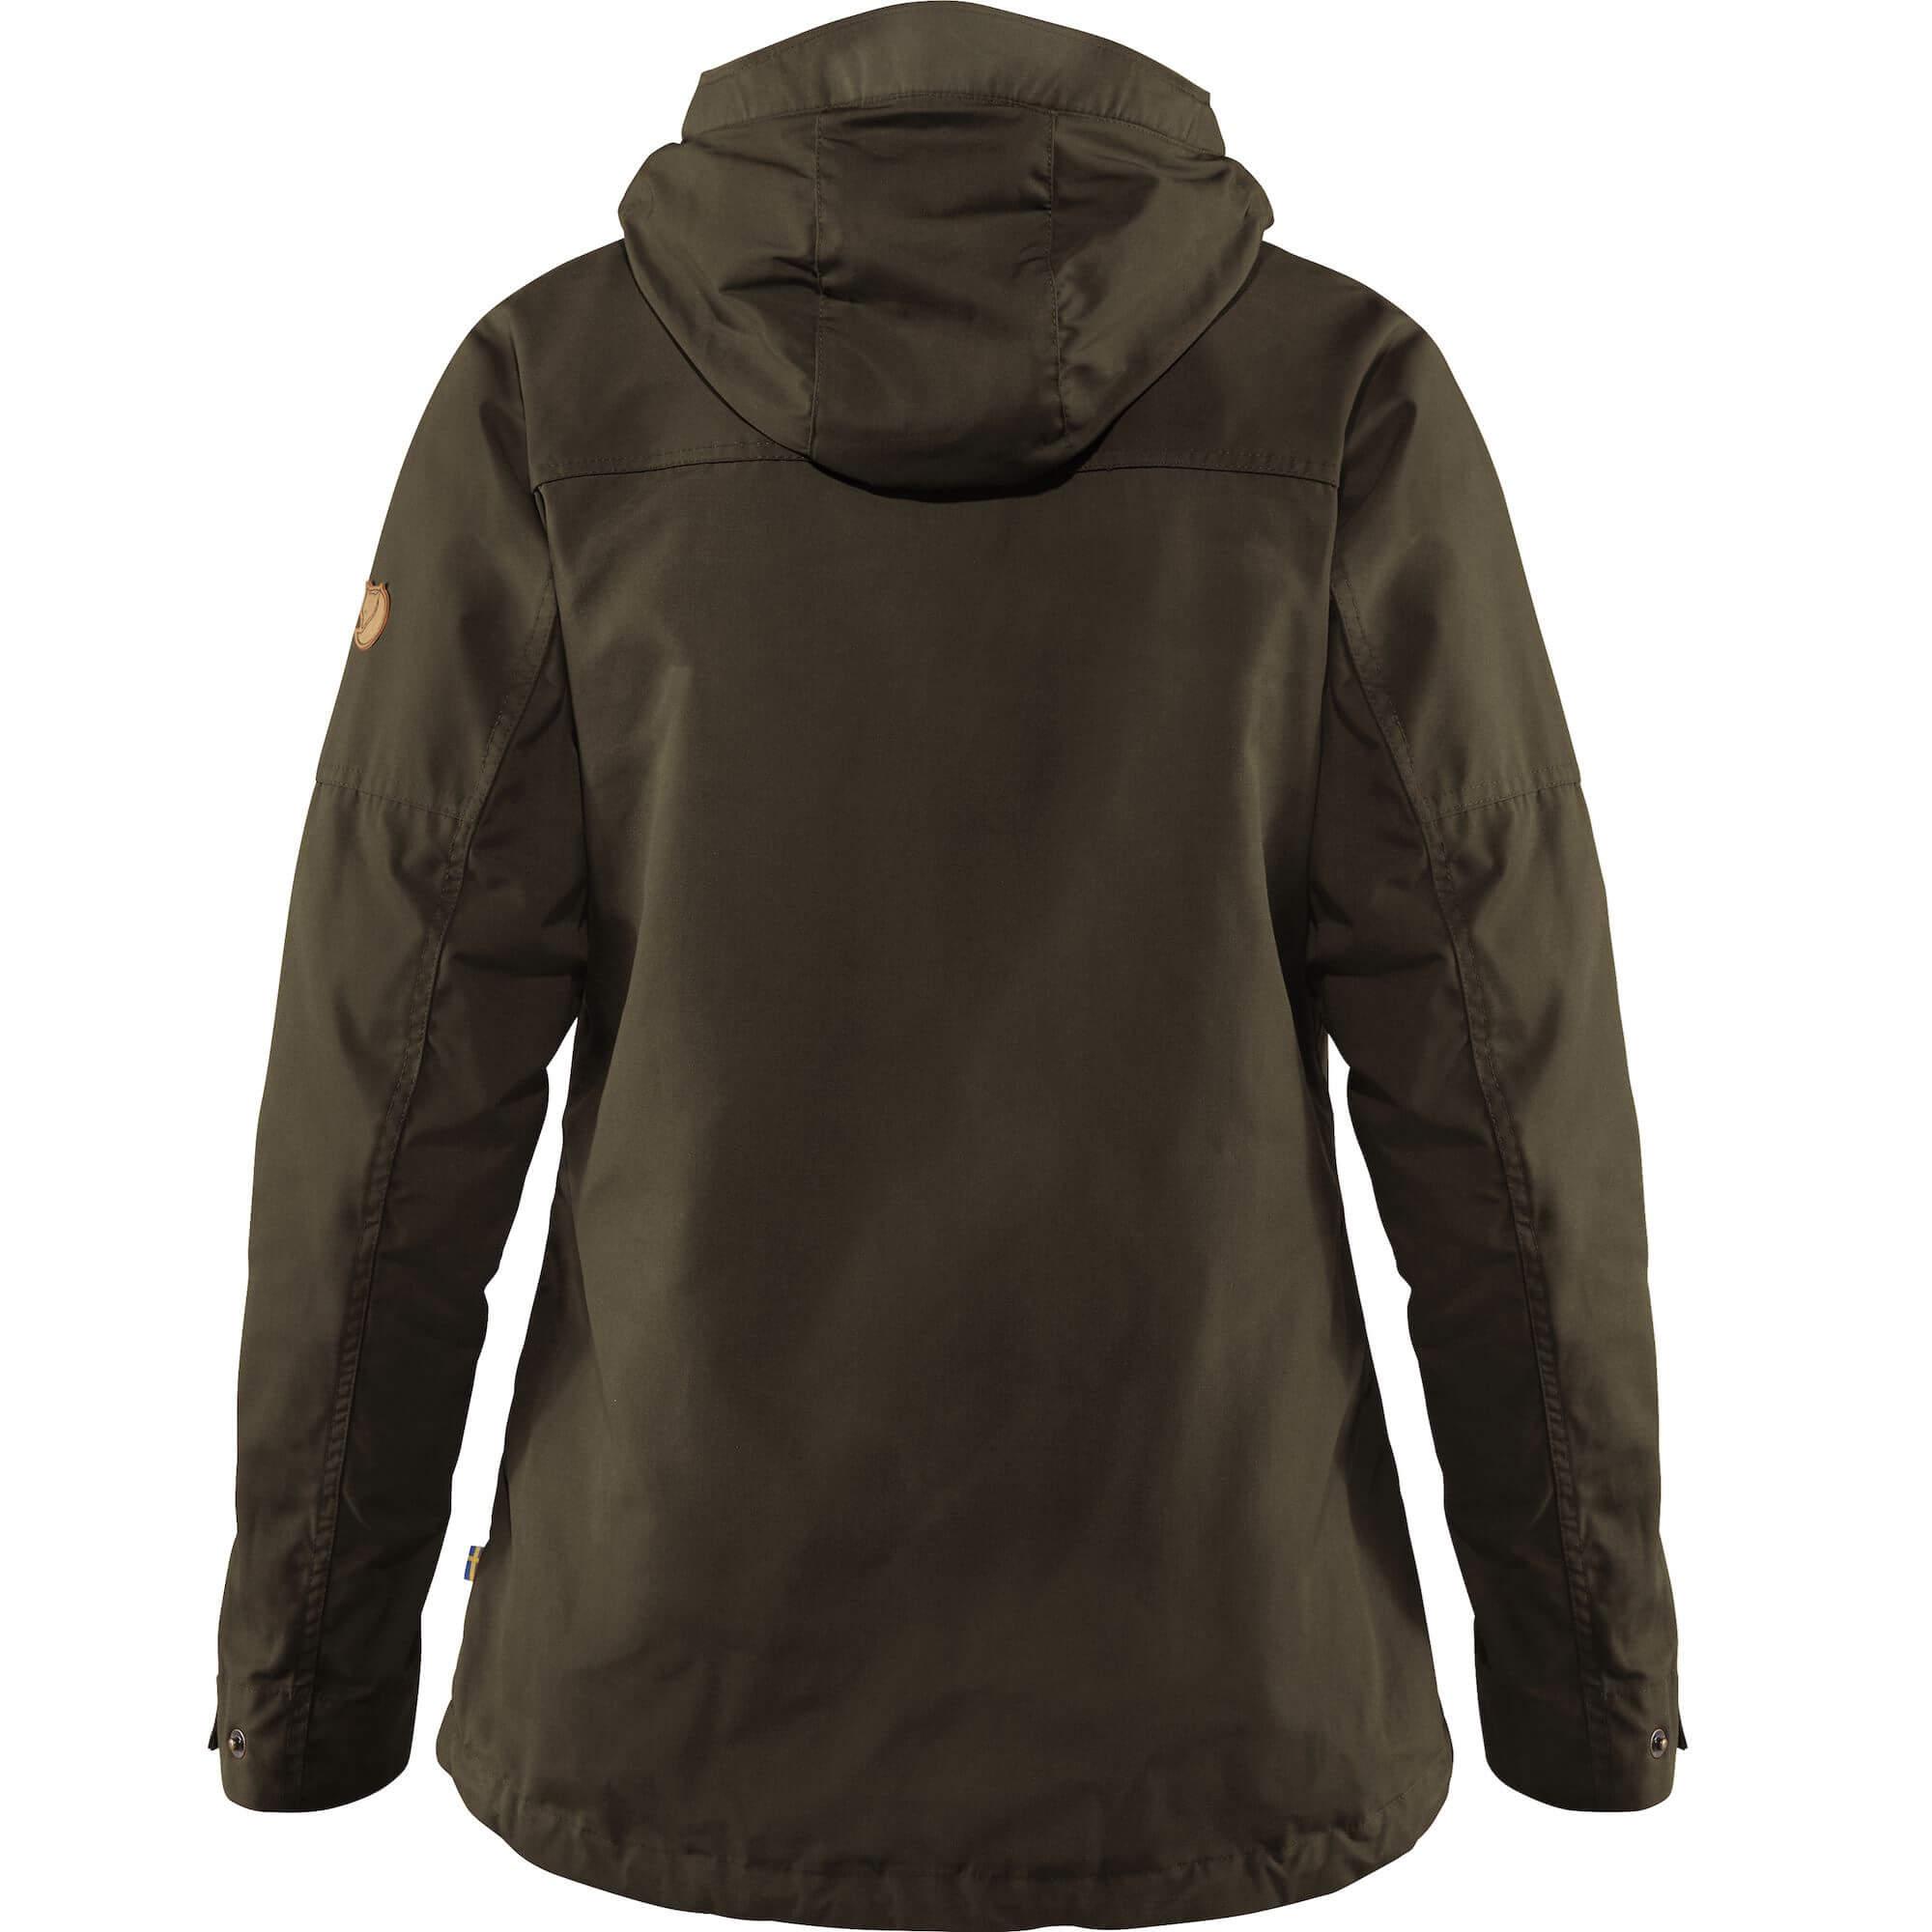 Ubrania dla leśników - Kurtka Fjallraven damska Vidda Pro 89856